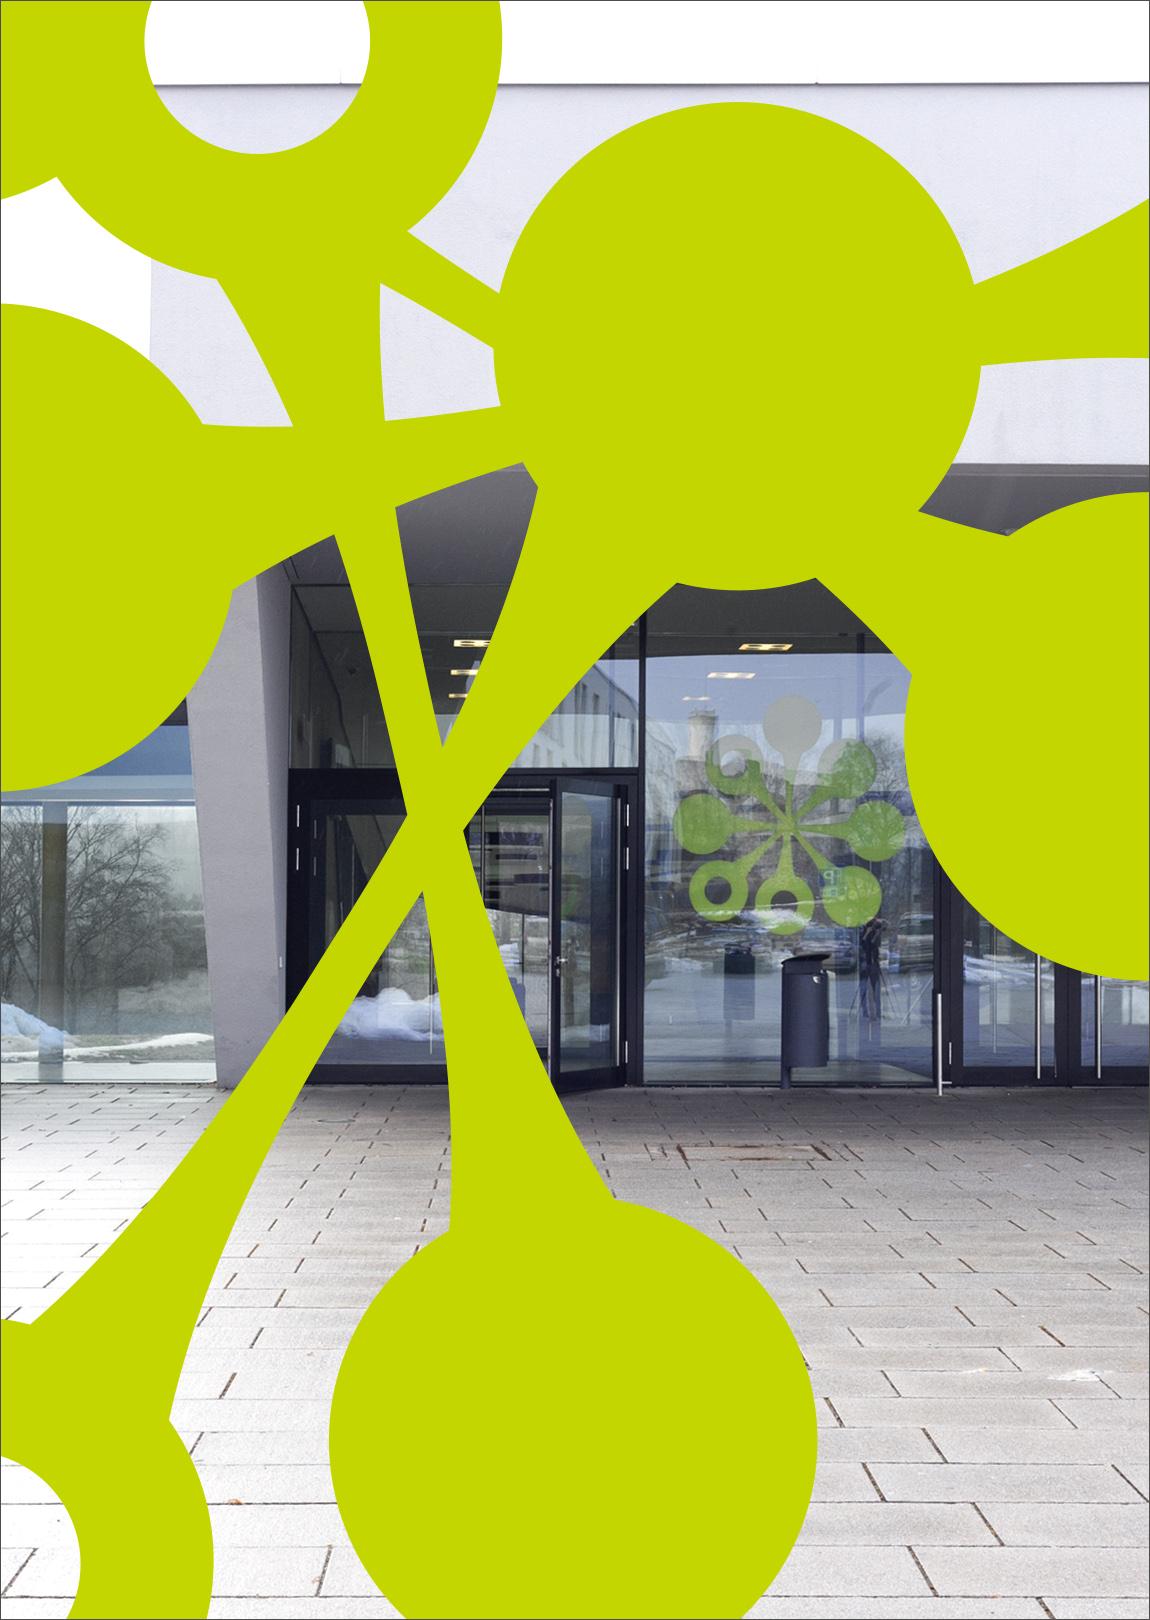 Szenografie Lernende Kulturregion Schwäbische Alb Engenhart 2